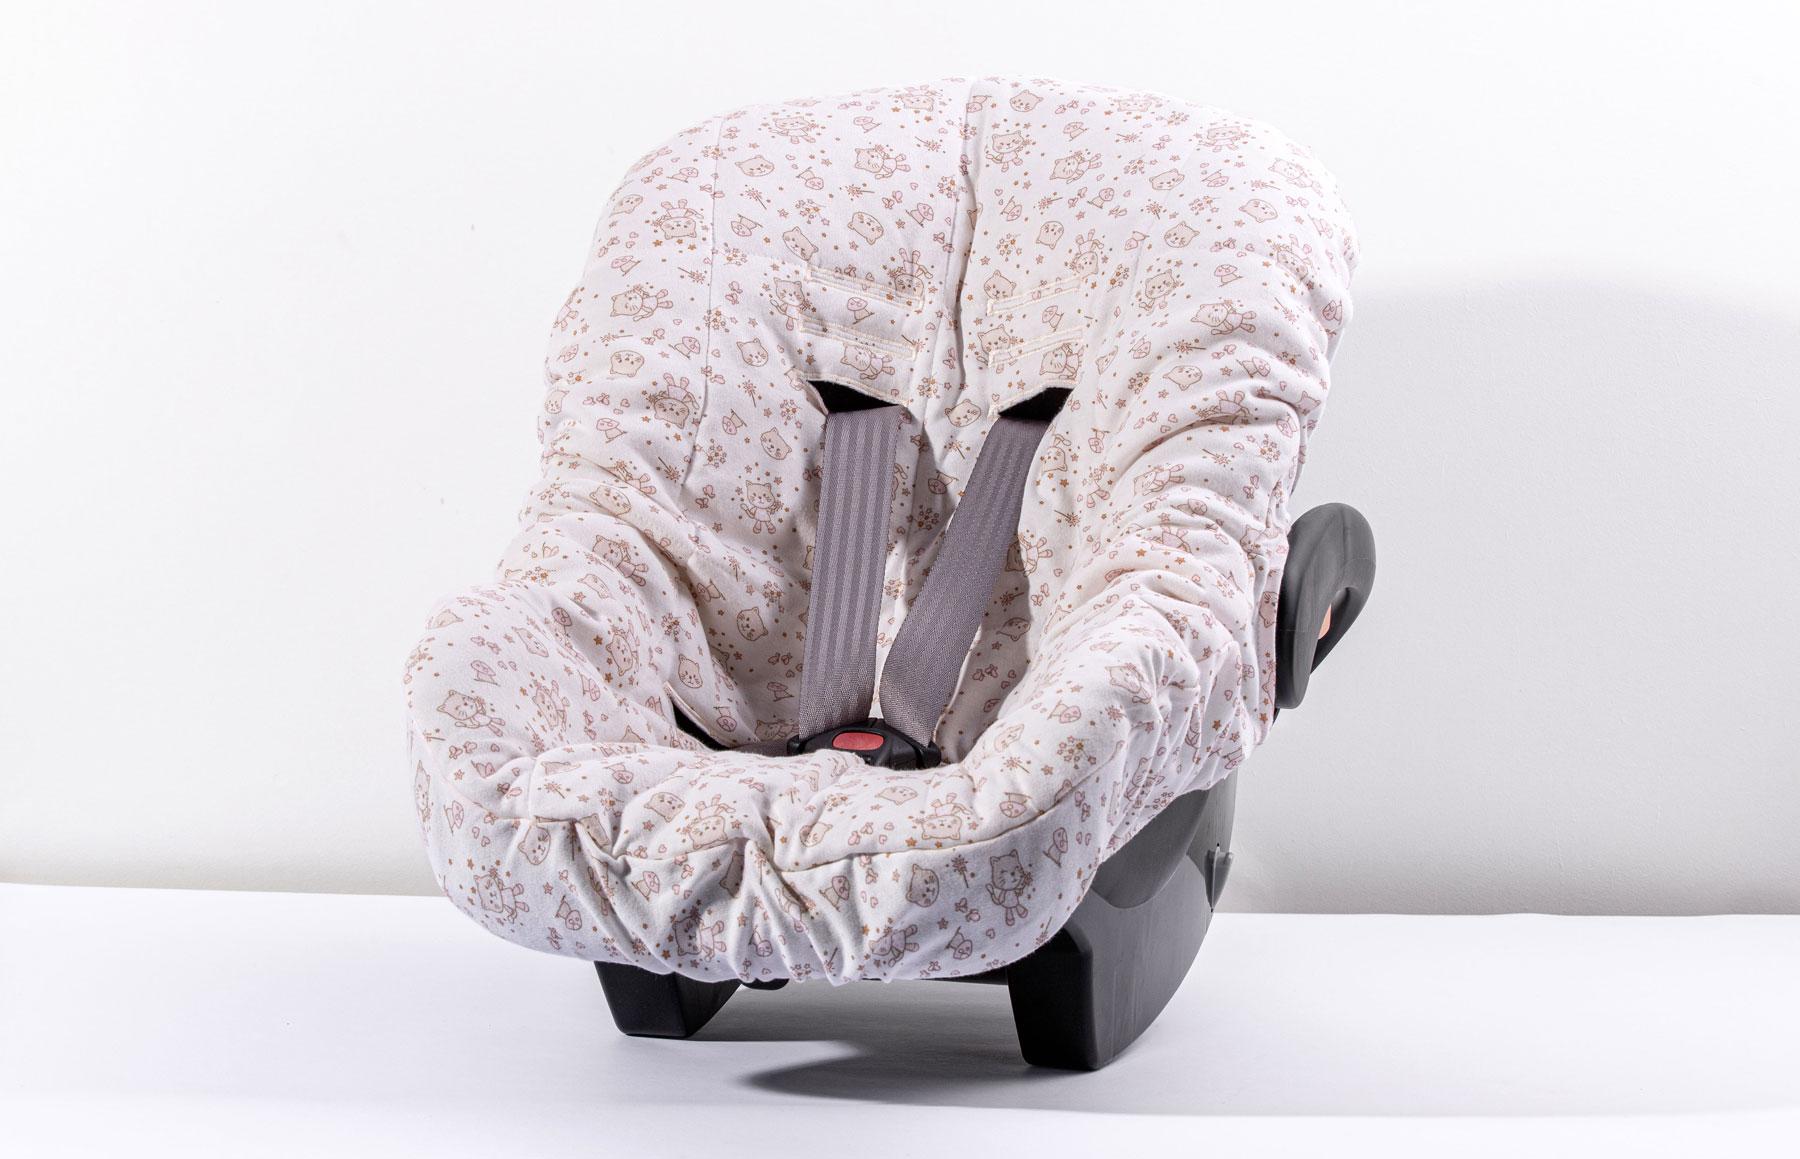 Capa De Bebê Conforto Mundo De Fantasia